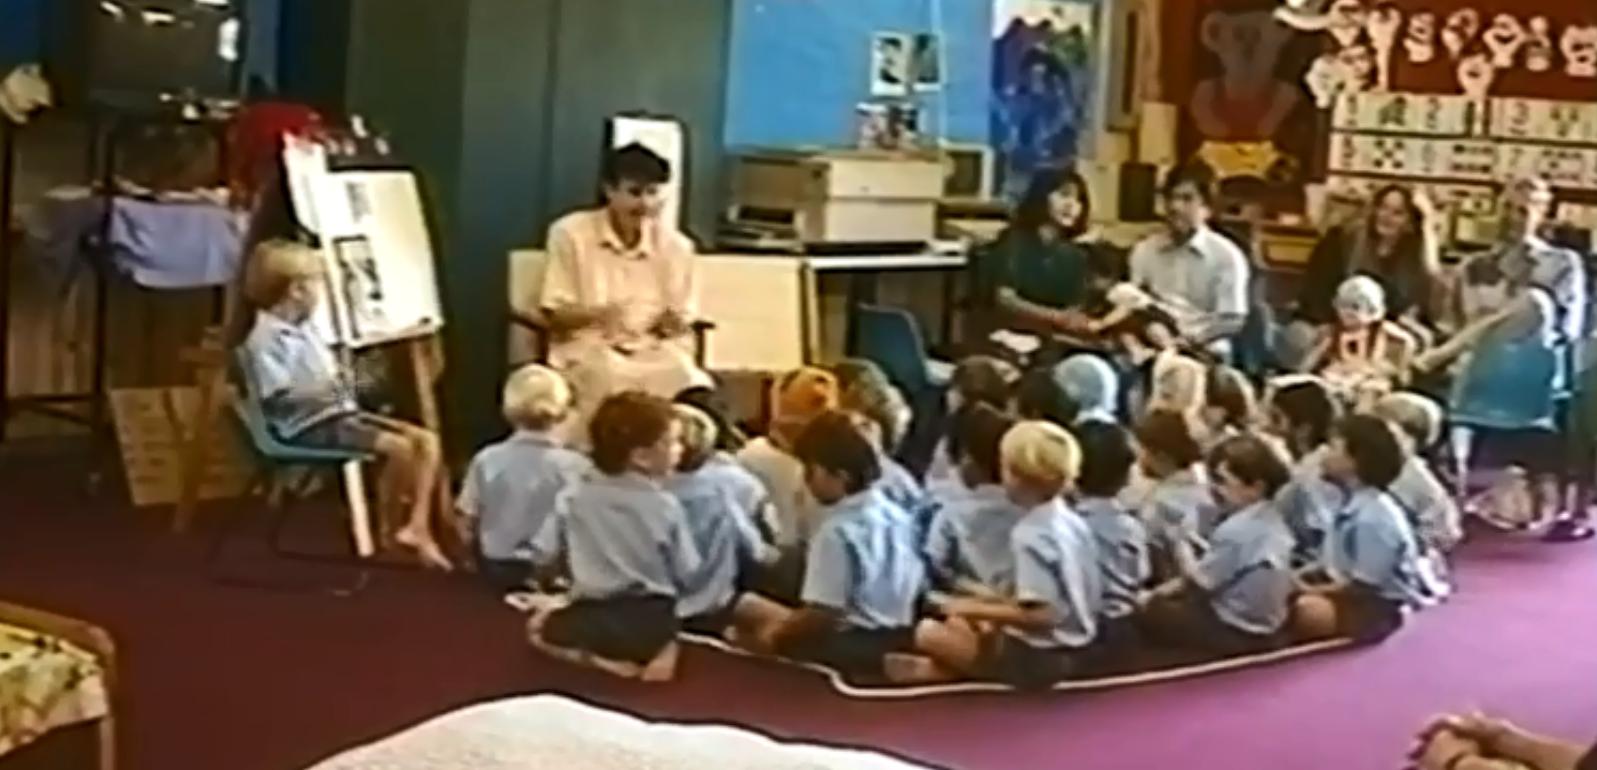 Marion Barter teaching children in her class.